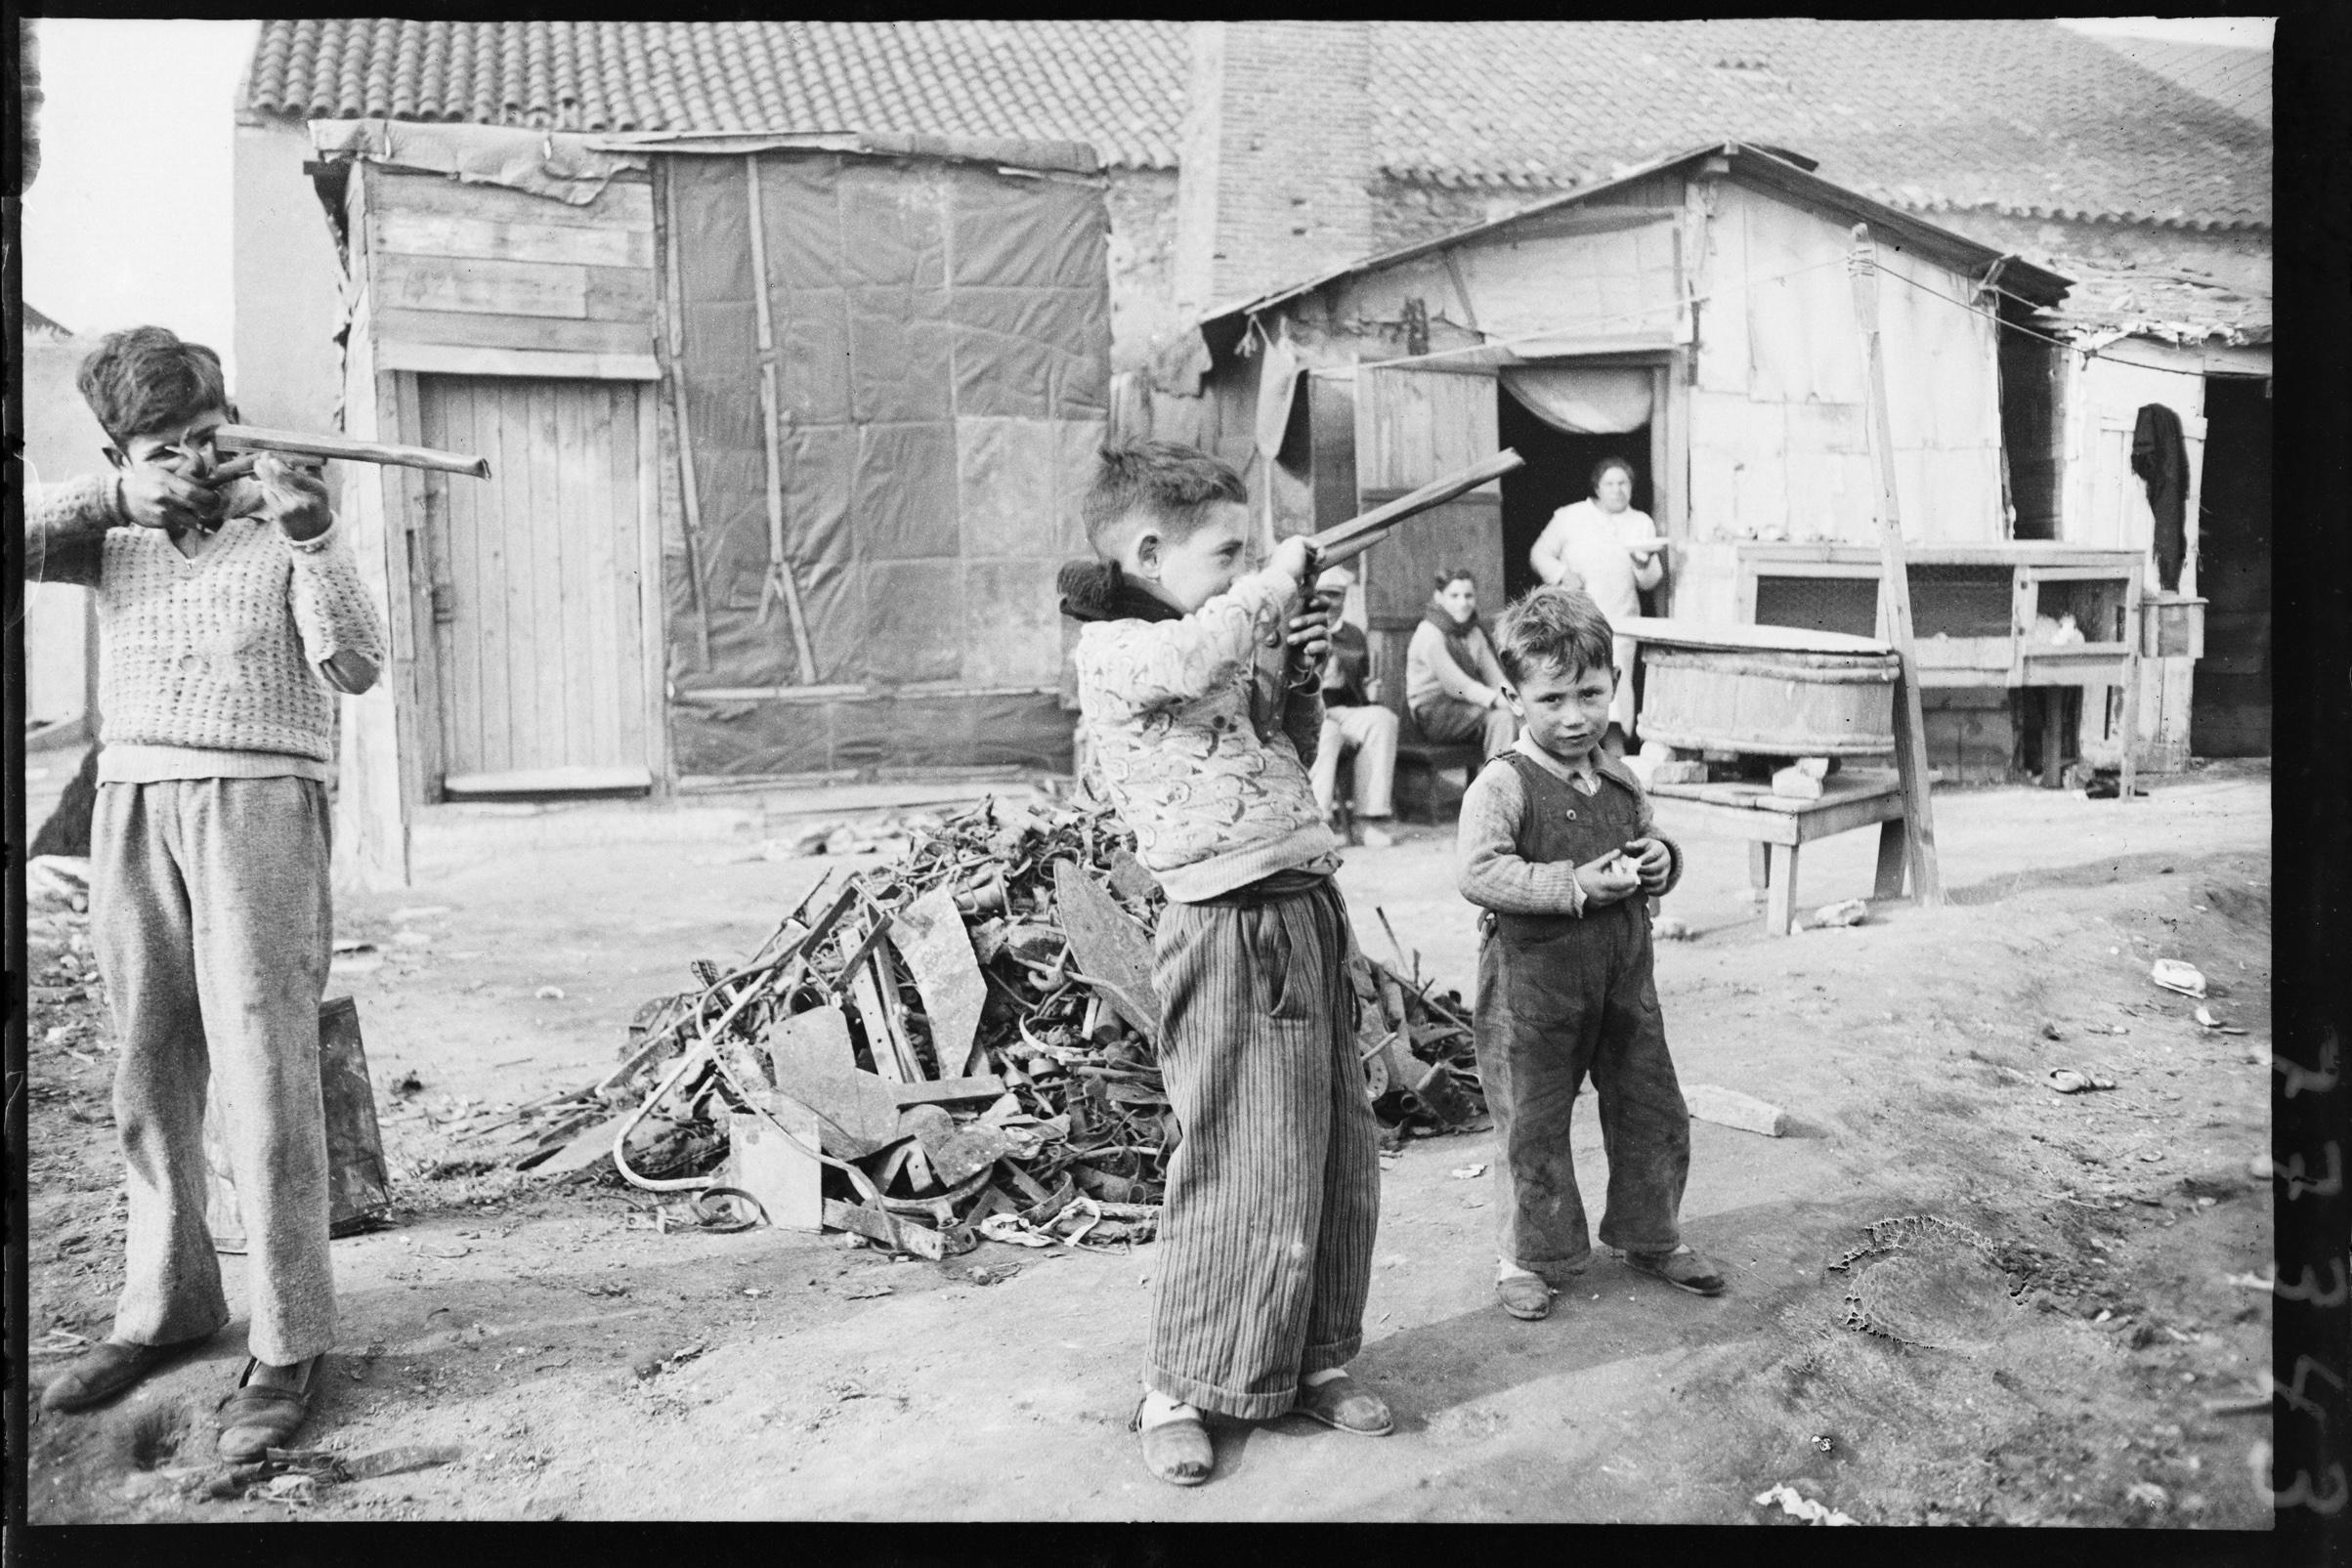 Barracas del barrio de Somorrostro Barcelona, c.1930 © Fondo BRANGULÍ, ANC